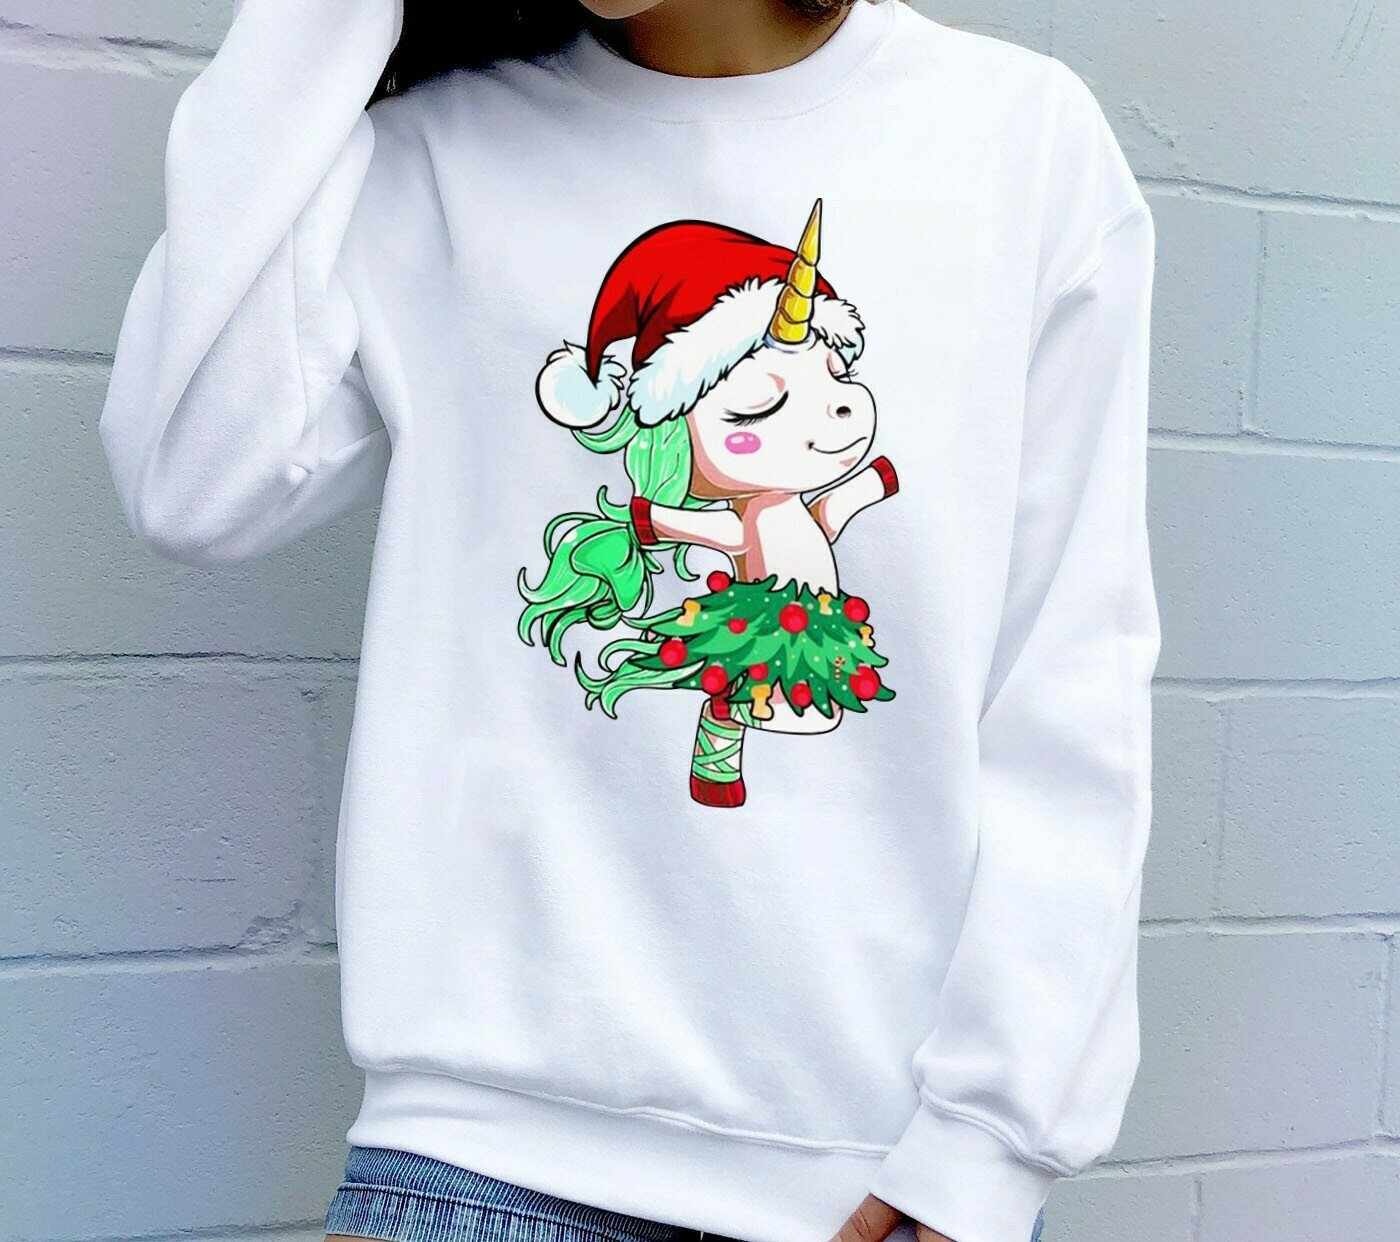 Santa Unicorn Ugly Christmas Tree Dance,Unicorn Christmas,Dabbing Around Christmas Tree,Llama Unicorn Cute,Magical Christmas T-shirt Long Sleeve Sweatshirt Hoodie Jolly Family Gifts